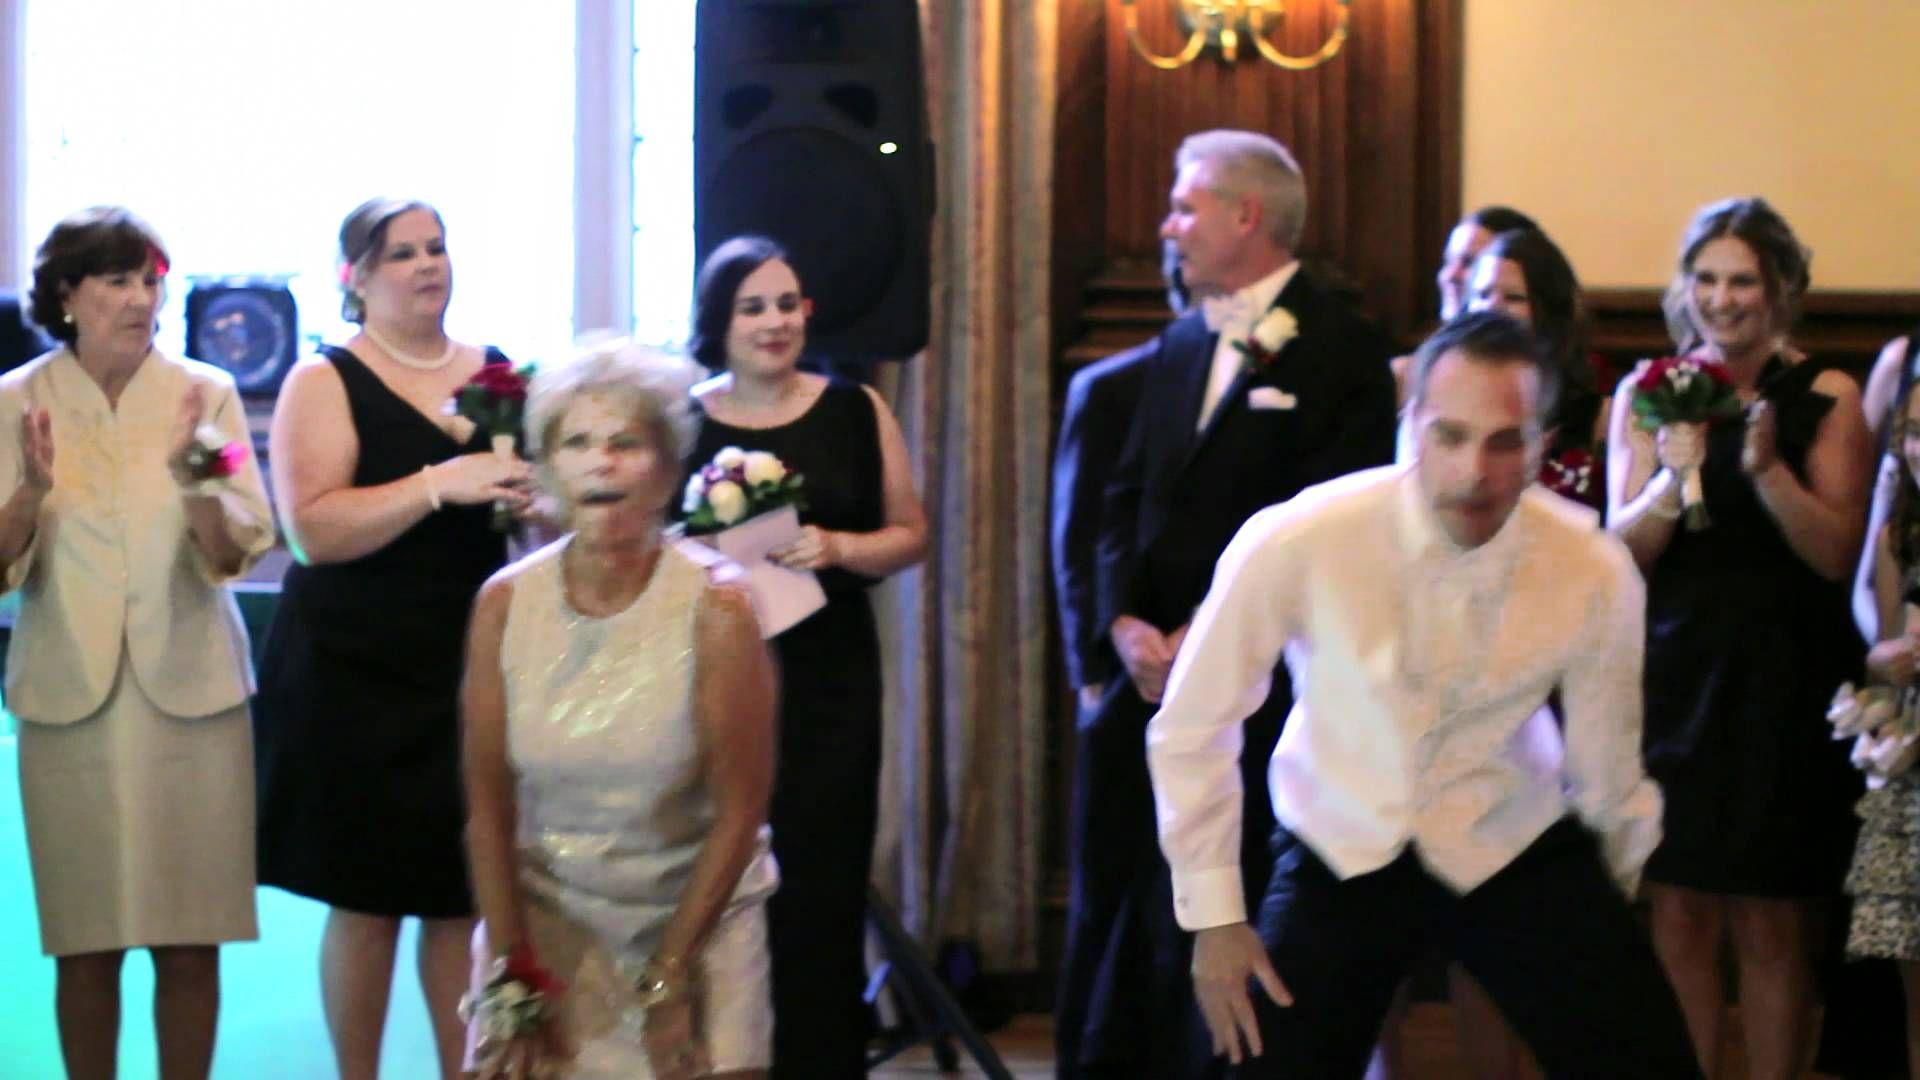 Best Mom And Son Wedding Dance Ever Philadelphia